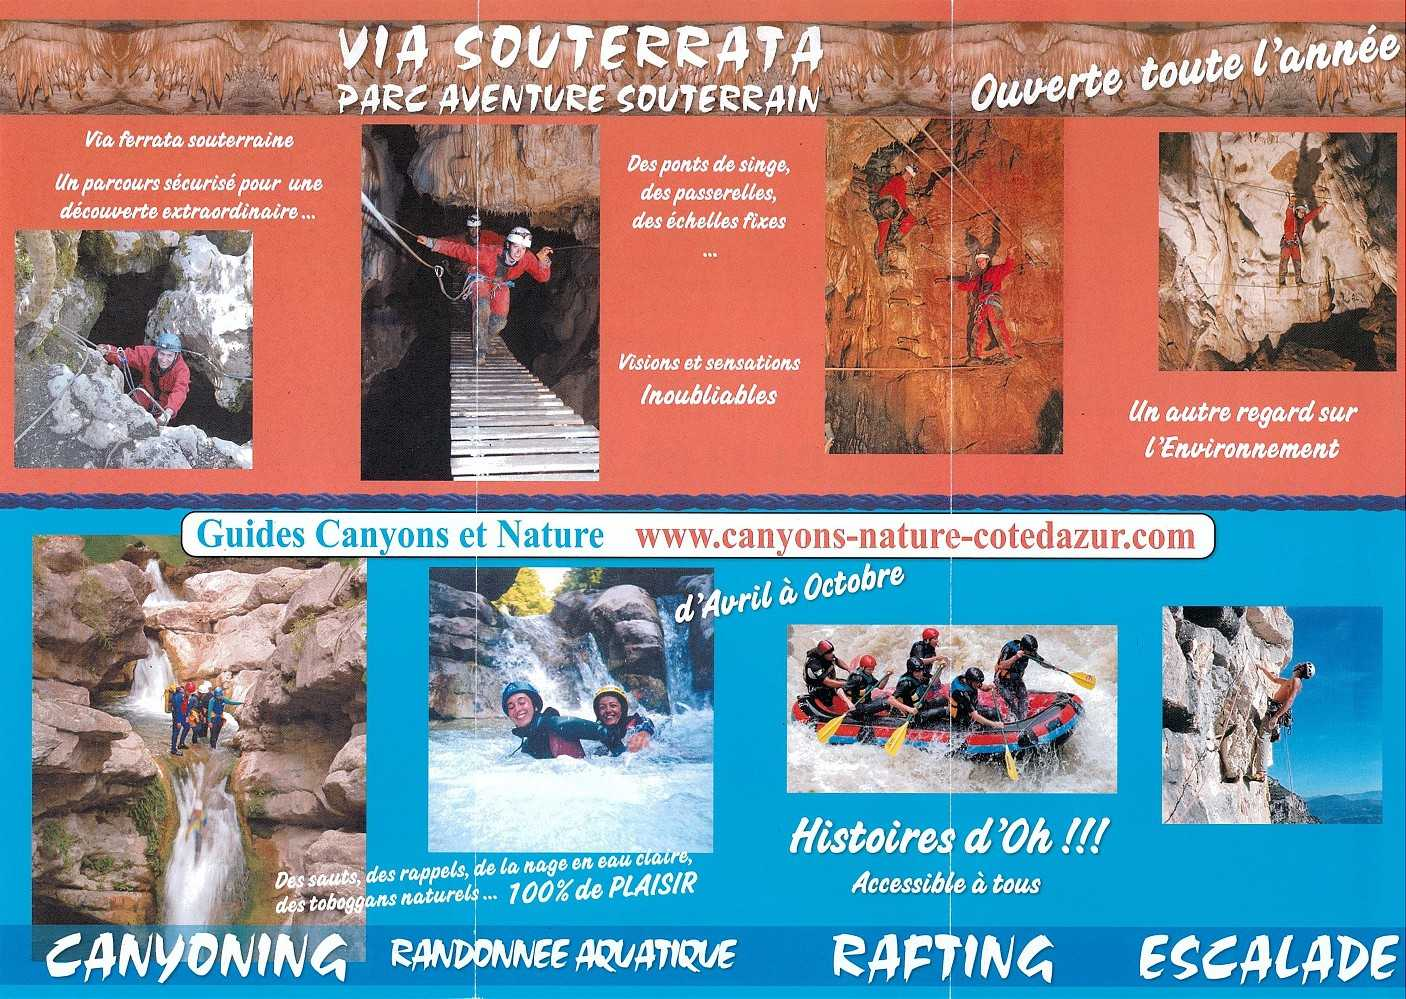 canyoning randonnées rafting escalade via souterrata canyons